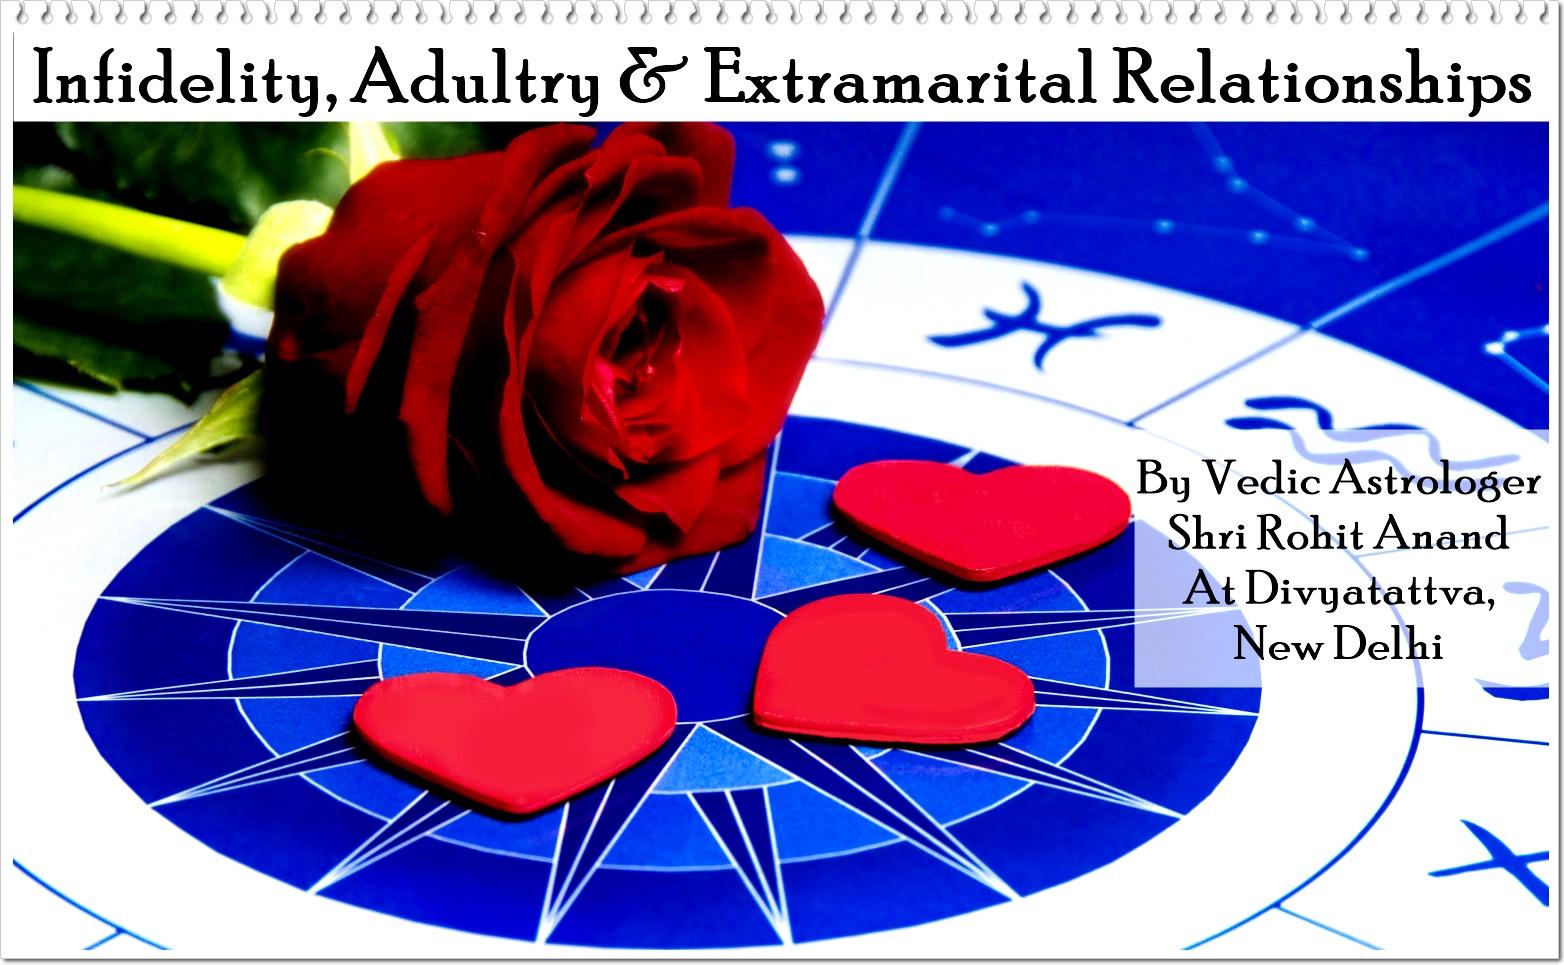 Psychic astrologer india free horoscopes online vedic astrology infidelity adultery extra marital affairs in horoscope indian vedic astrology by shri rohit anand at divyatattva new delhi india nvjuhfo Gallery